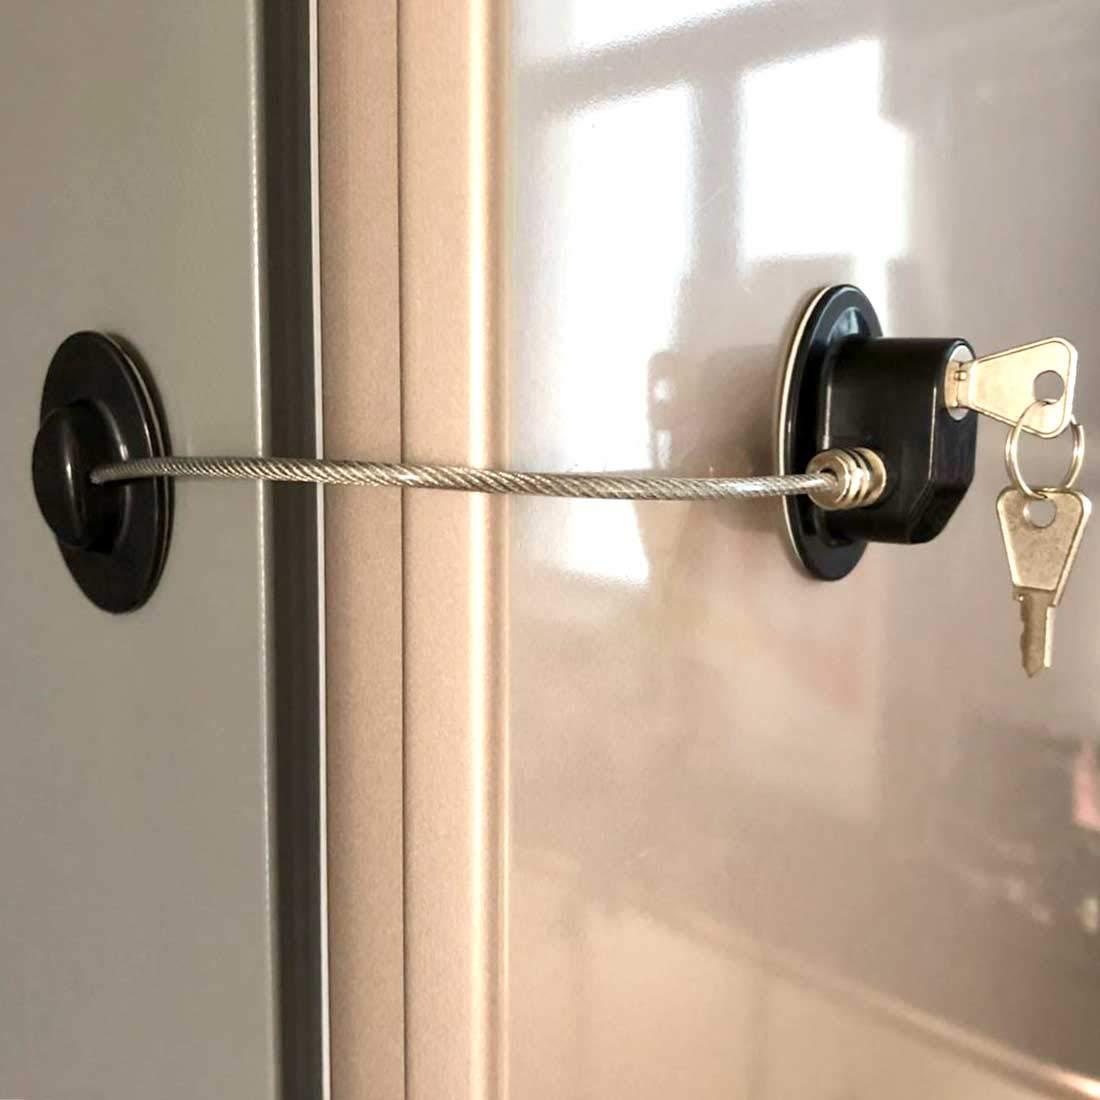 Child Safety Lock Refrigerator Door Lock Lock for Cabinet 1-Pack Black File Cabinet Lock ,Mini Fridge Lock Drawer Lock Refrigerator Door Locks